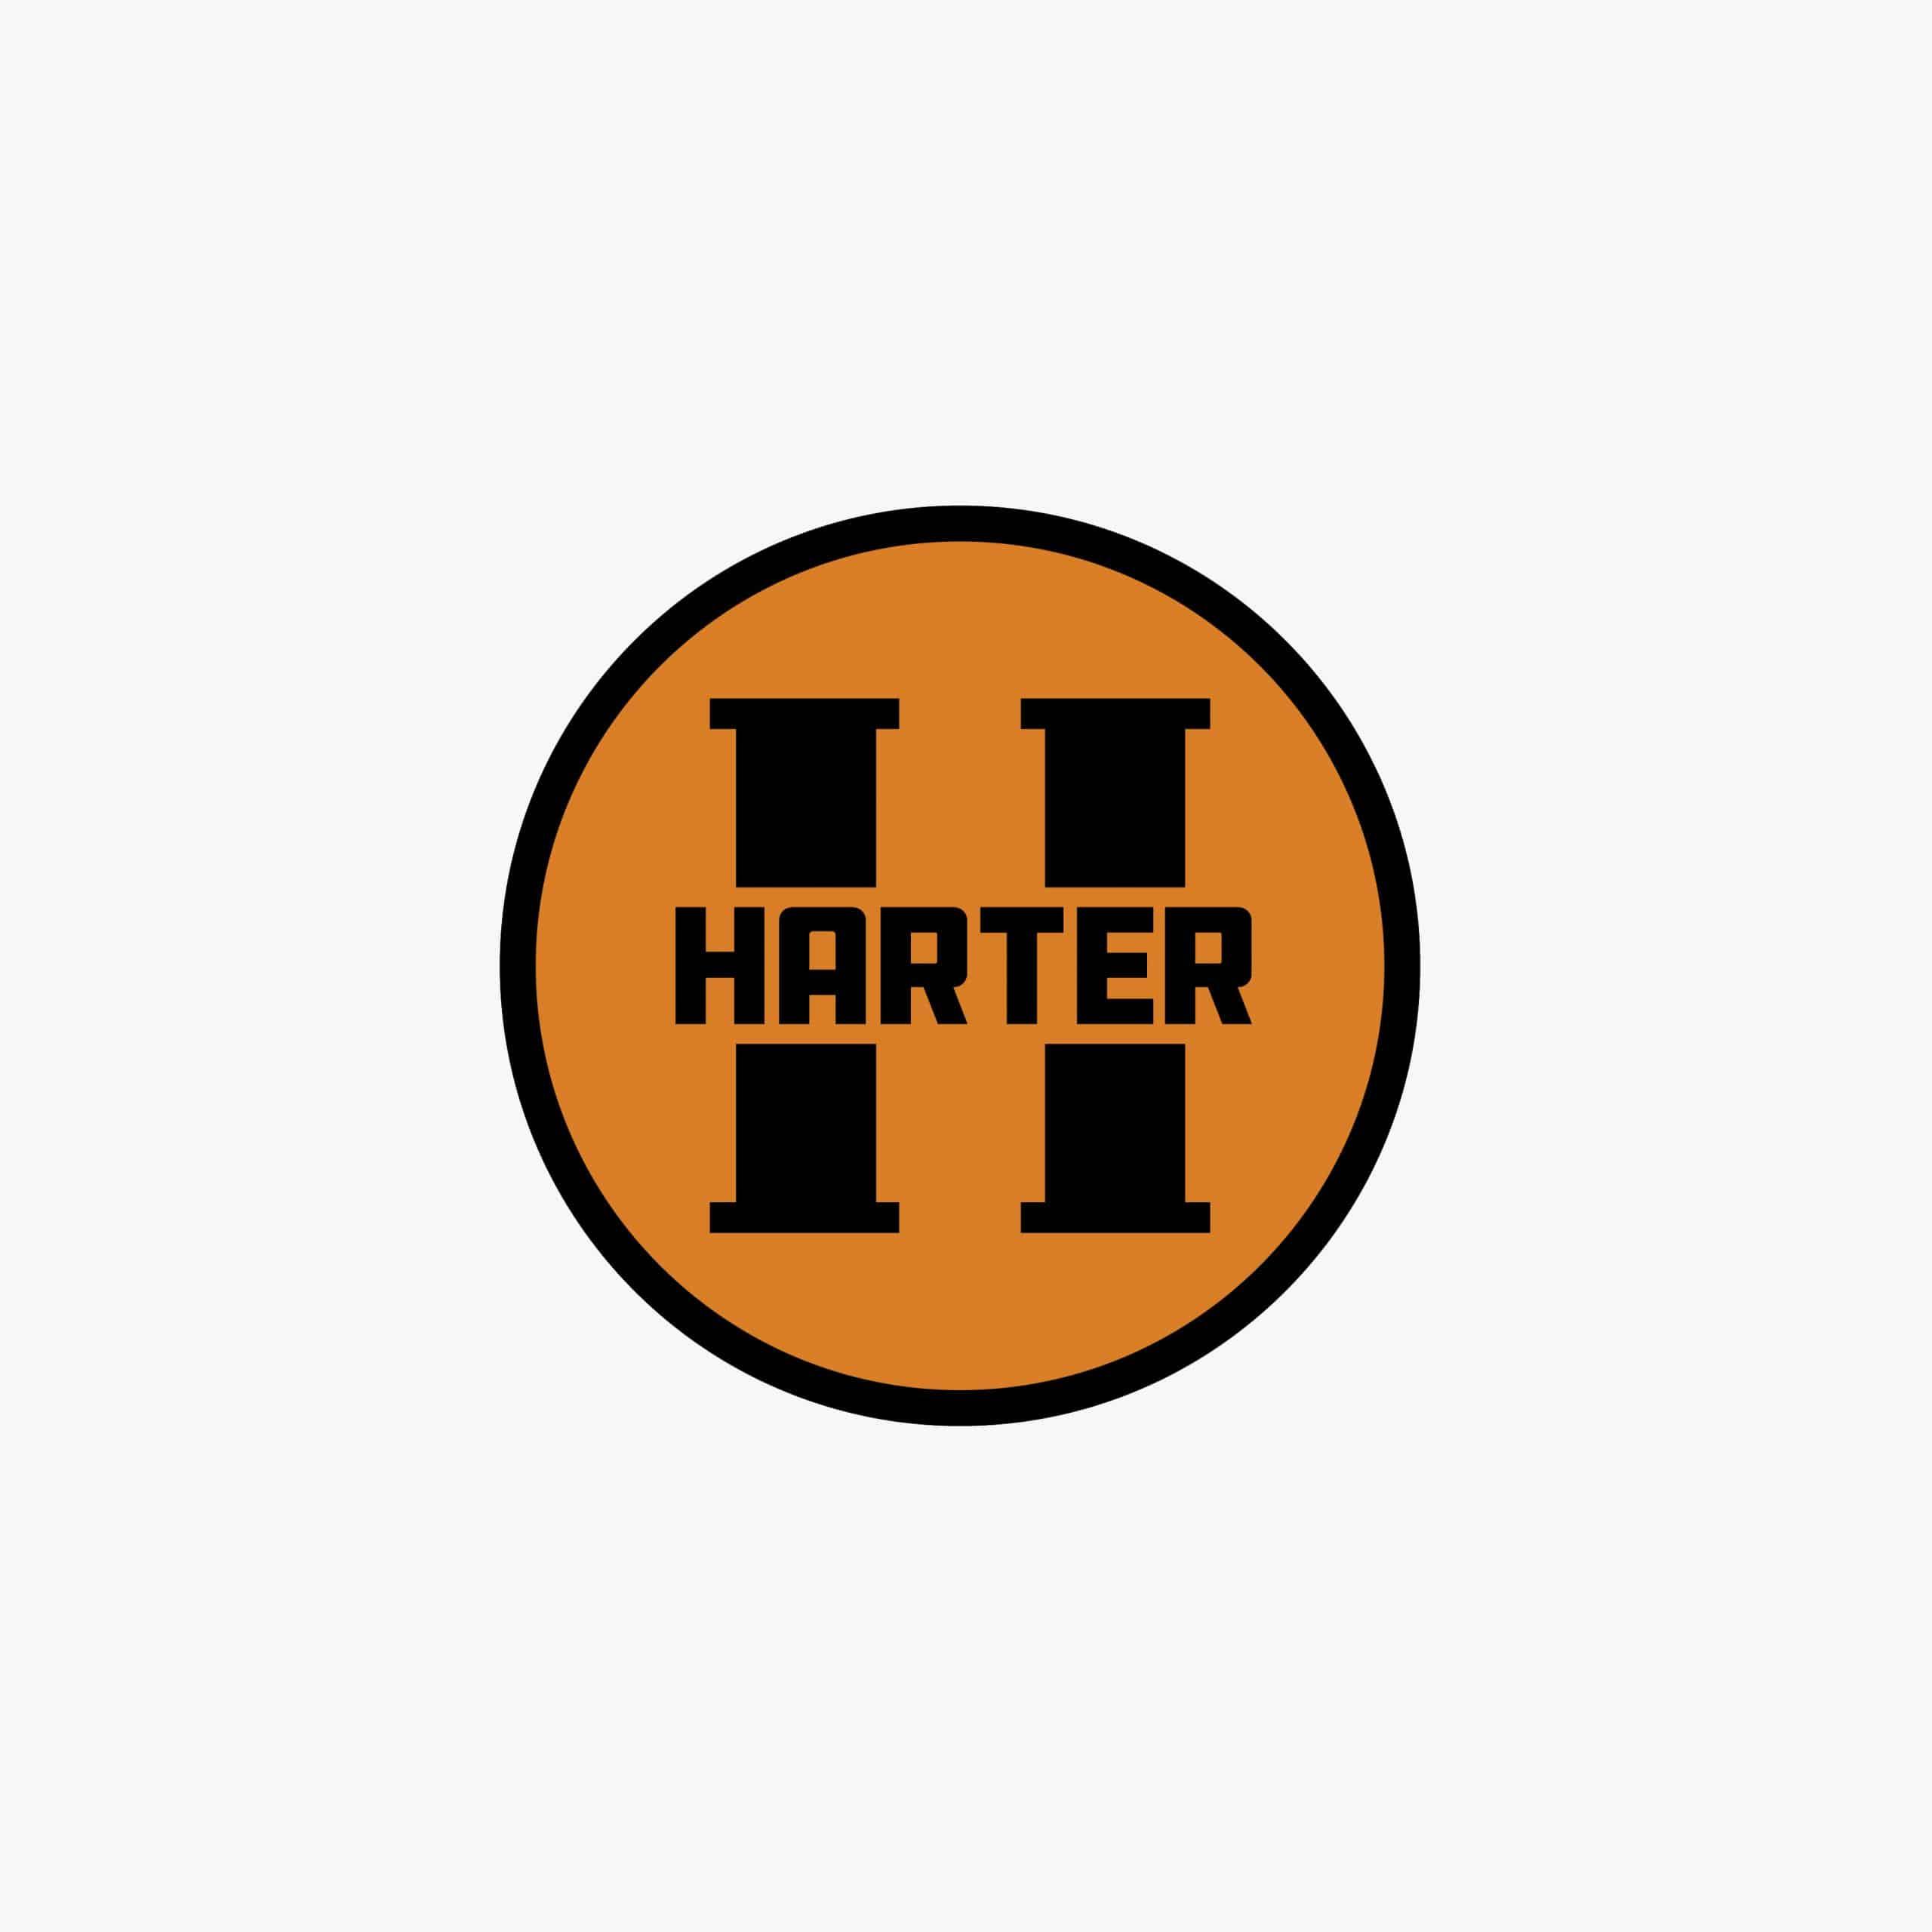 Stellen_Design_Graphic_Design_Logo_Design_Harter_Construction_ai-02